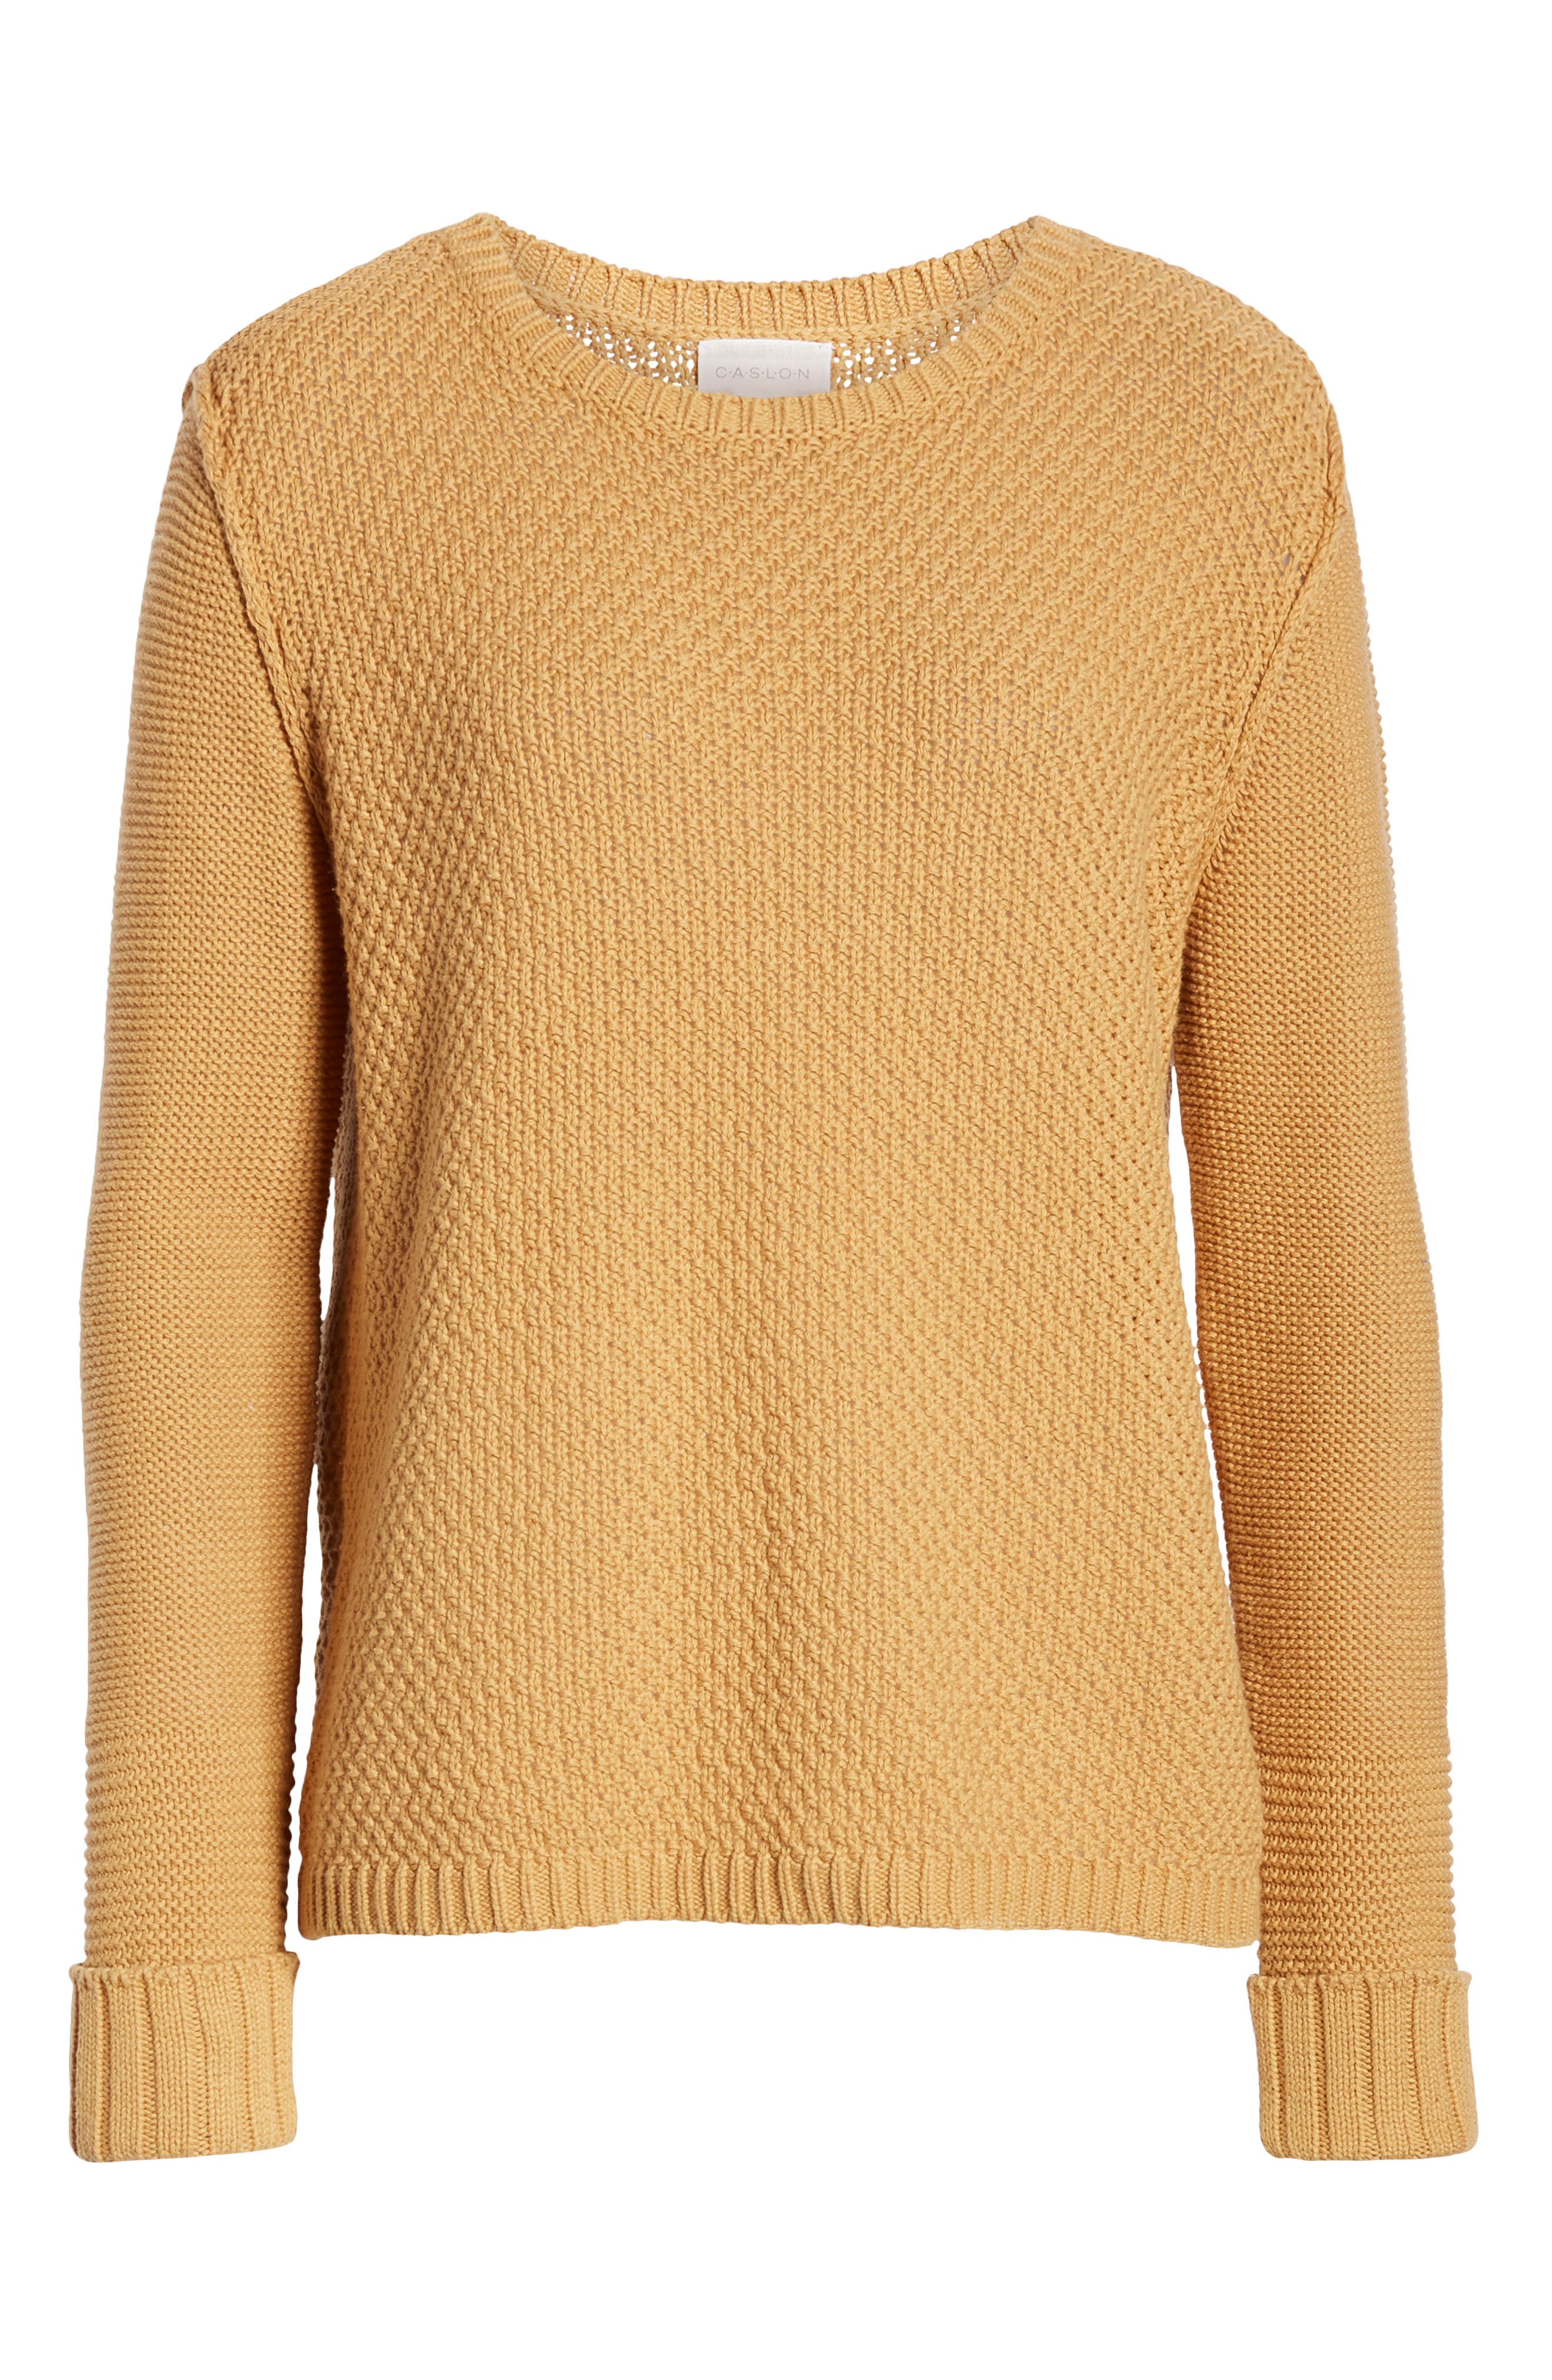 CASLON<SUP>®</SUP>, Mixed Stitch Sweater, Alternate thumbnail 6, color, TAN CINNAMON